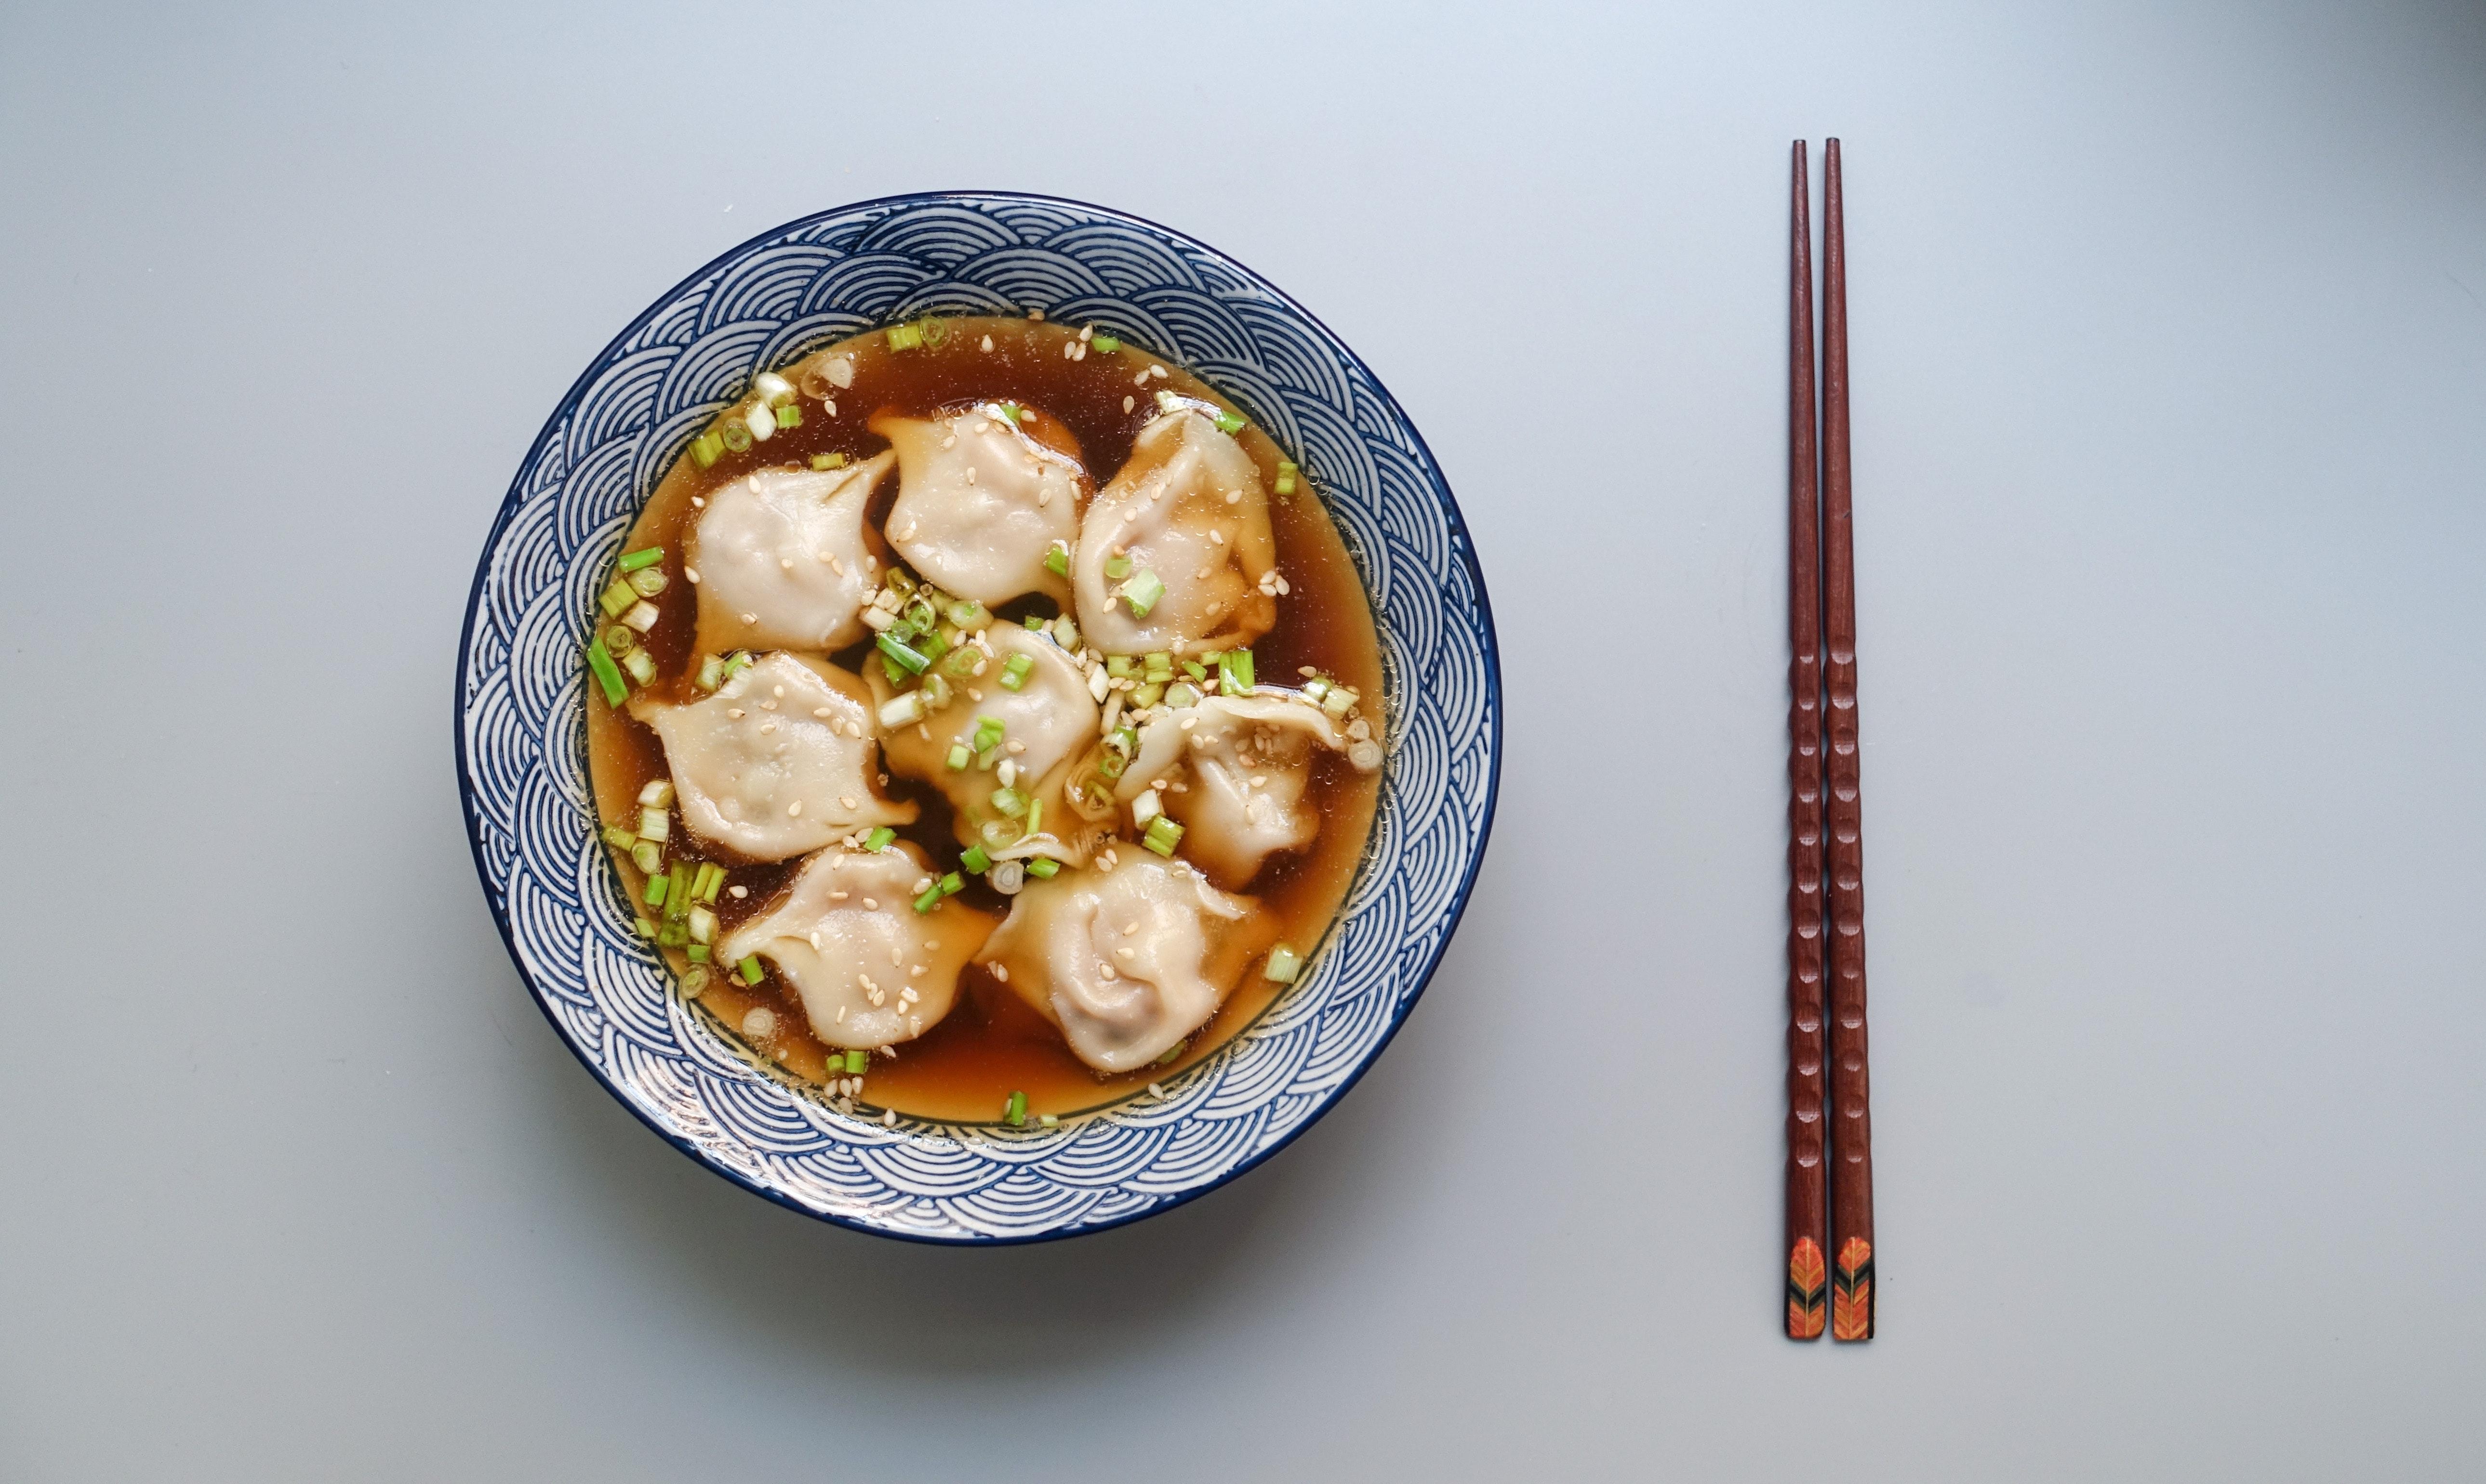 bowl-chopsticks-cuisine-955137